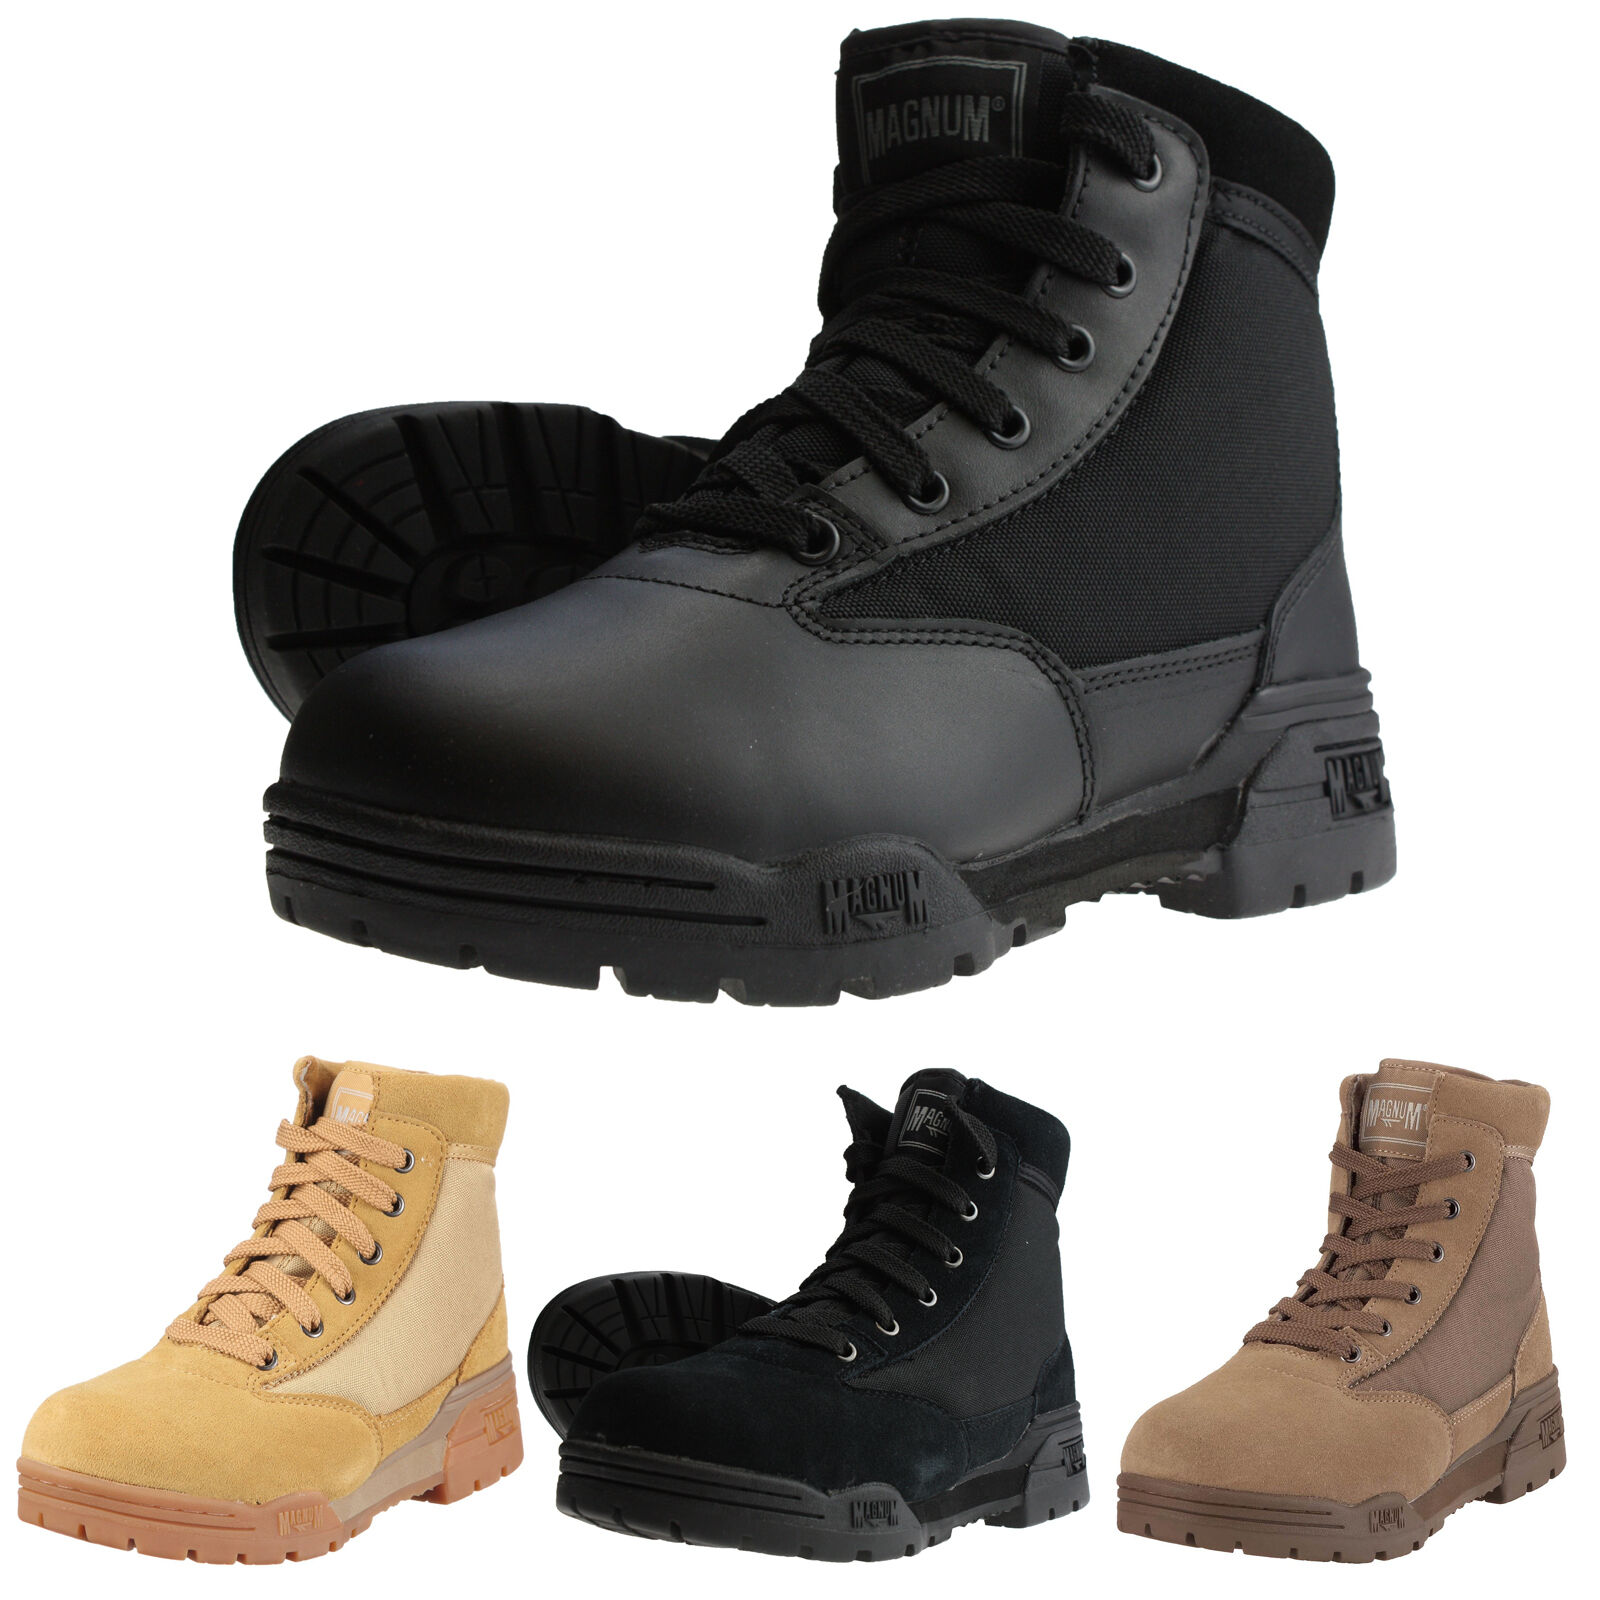 HI-Tec-Magnum Mid Boots Stivali Ranger Uomo e Donna Security Ranger Stivali Scarpe paintb 302bb0